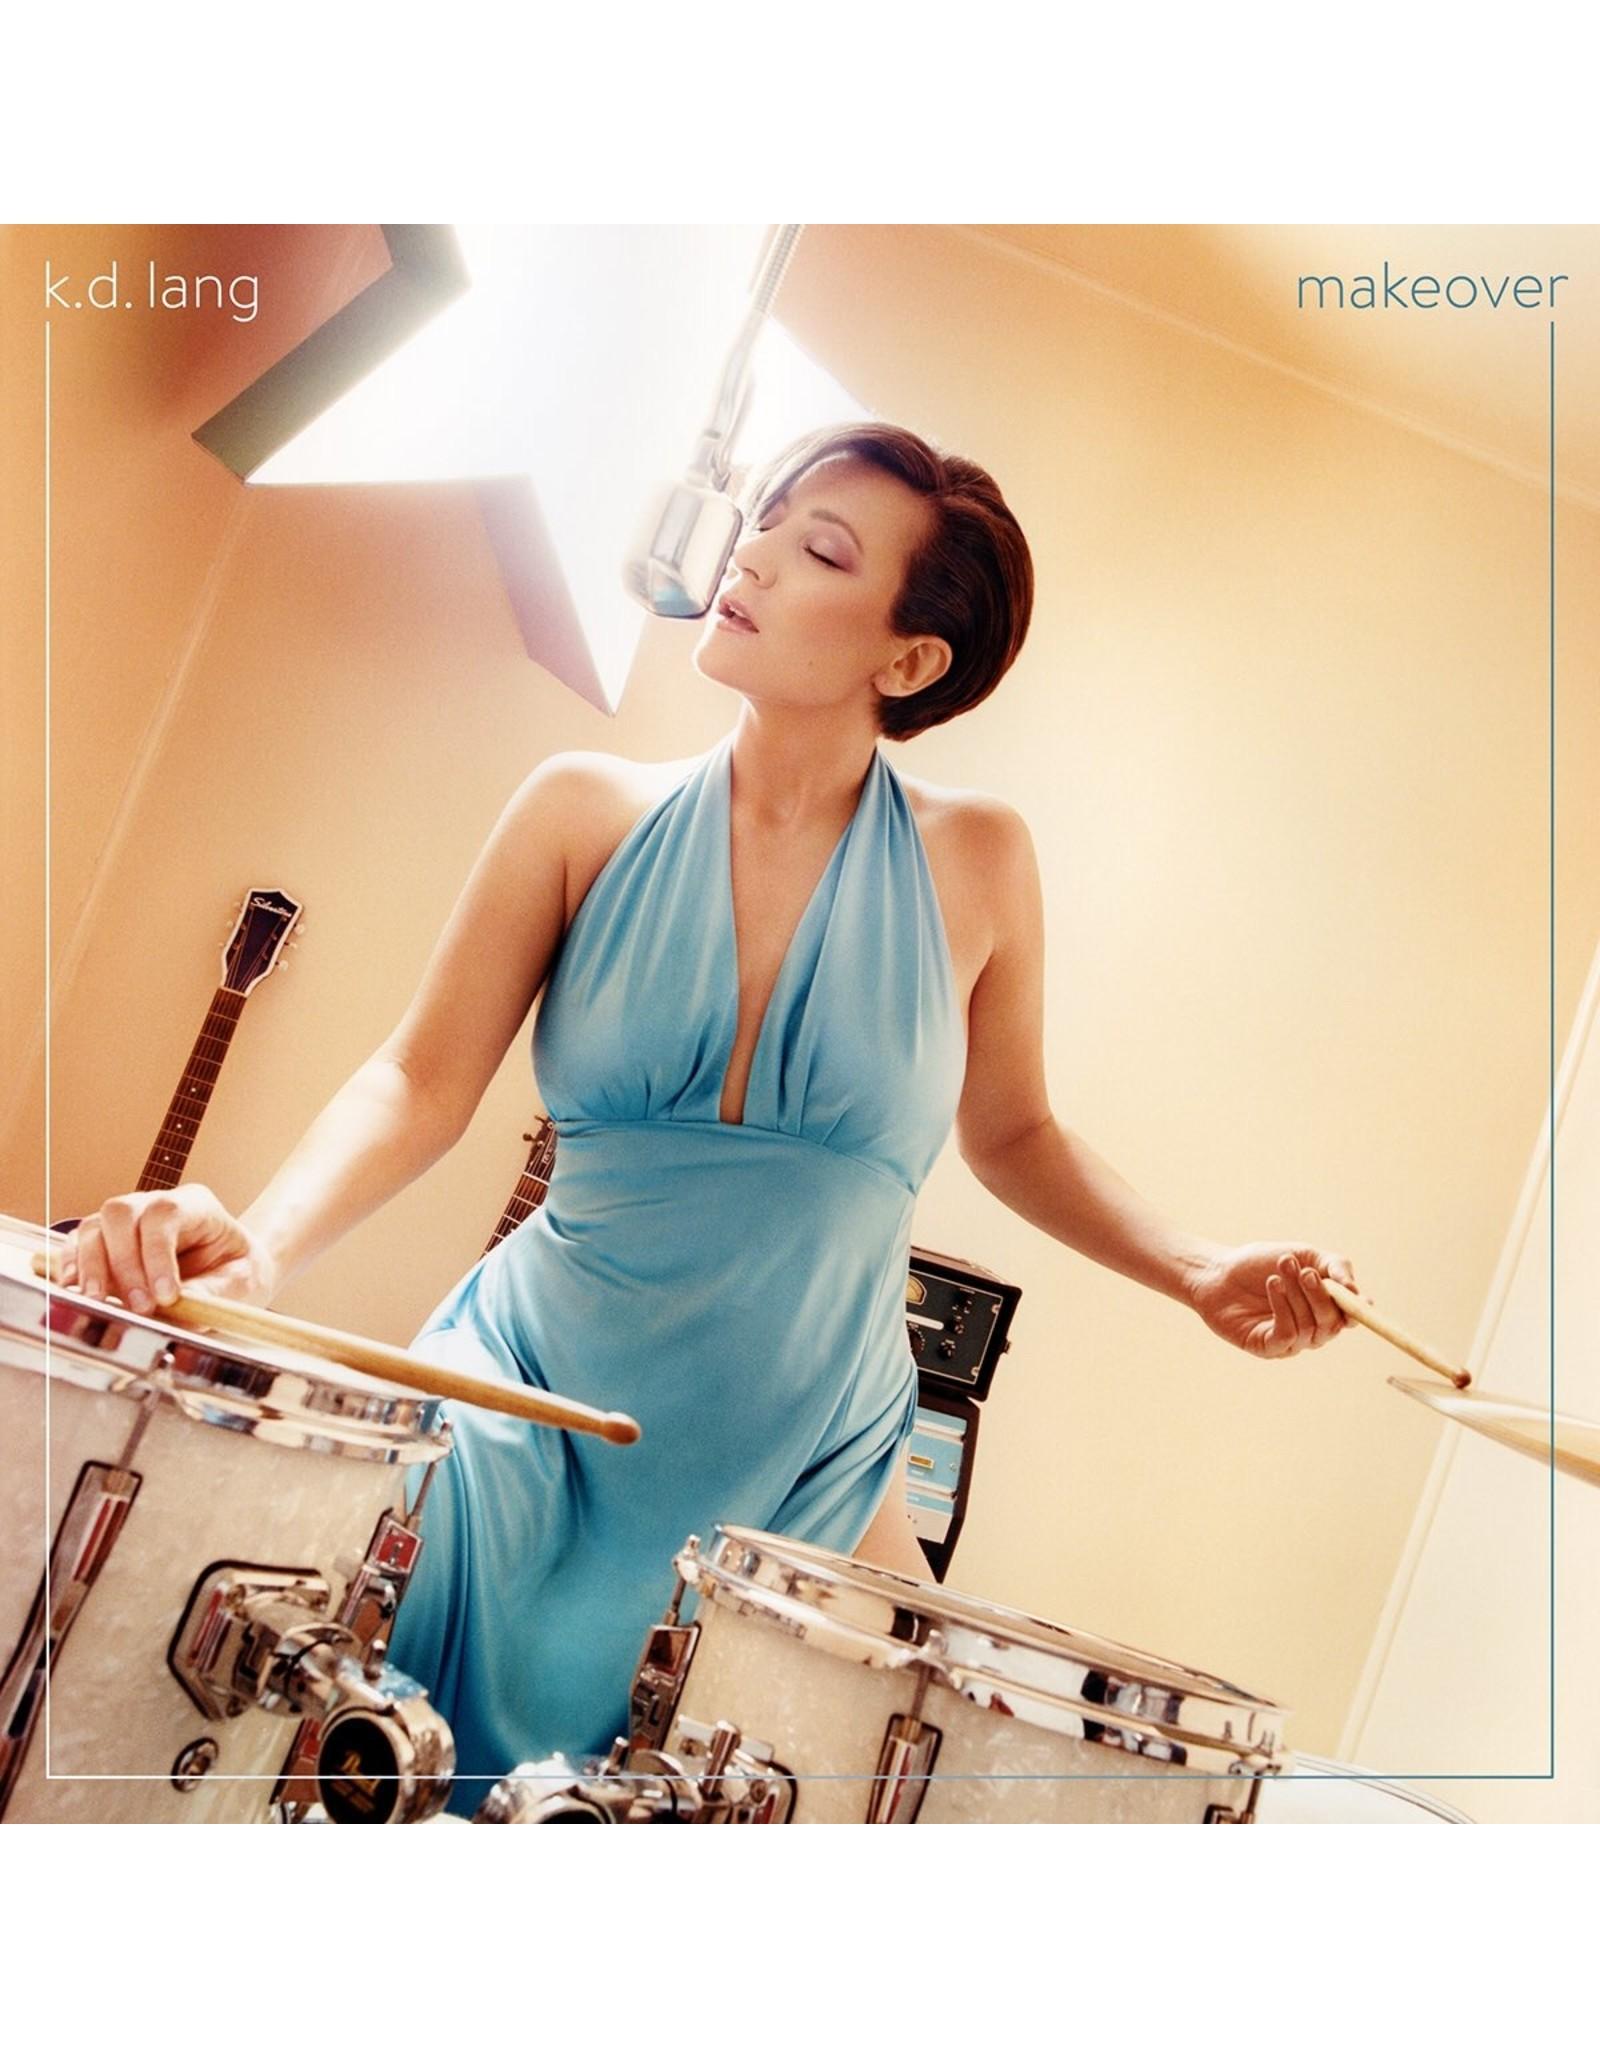 k.d. lang - Makeover (Translucent Turquoise Vinyl)